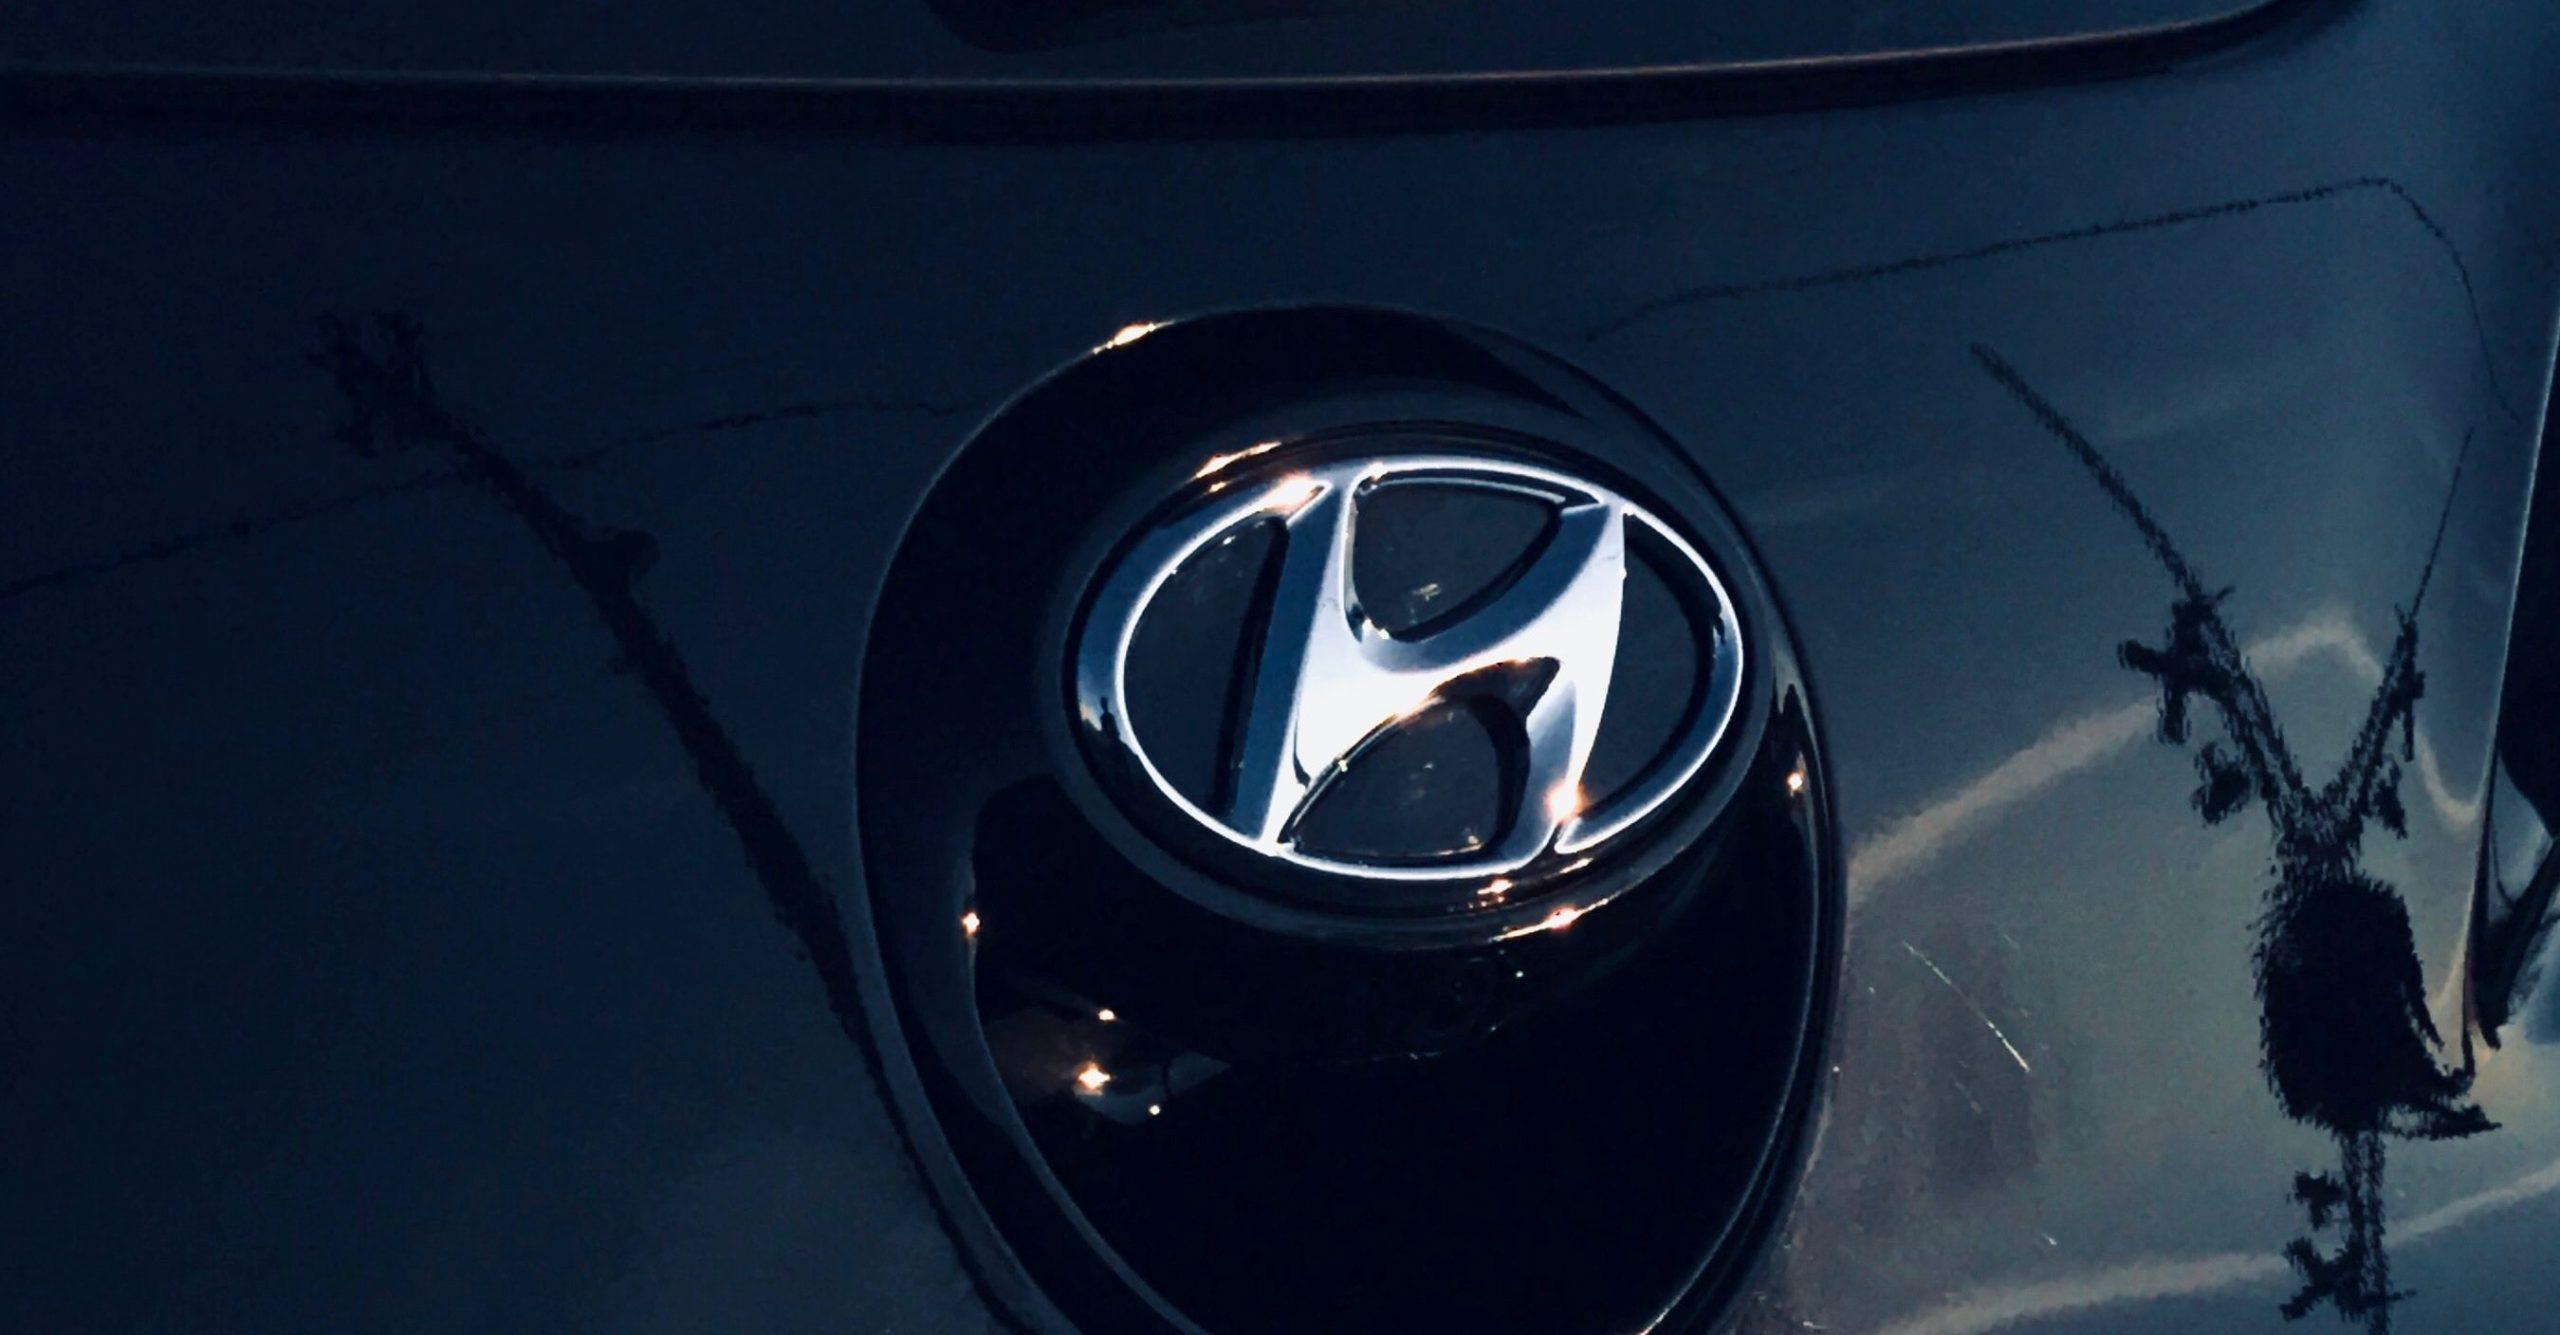 Hyundai Elantra N 2022 is a Powerful Vehicle With Custom Engine Sounds